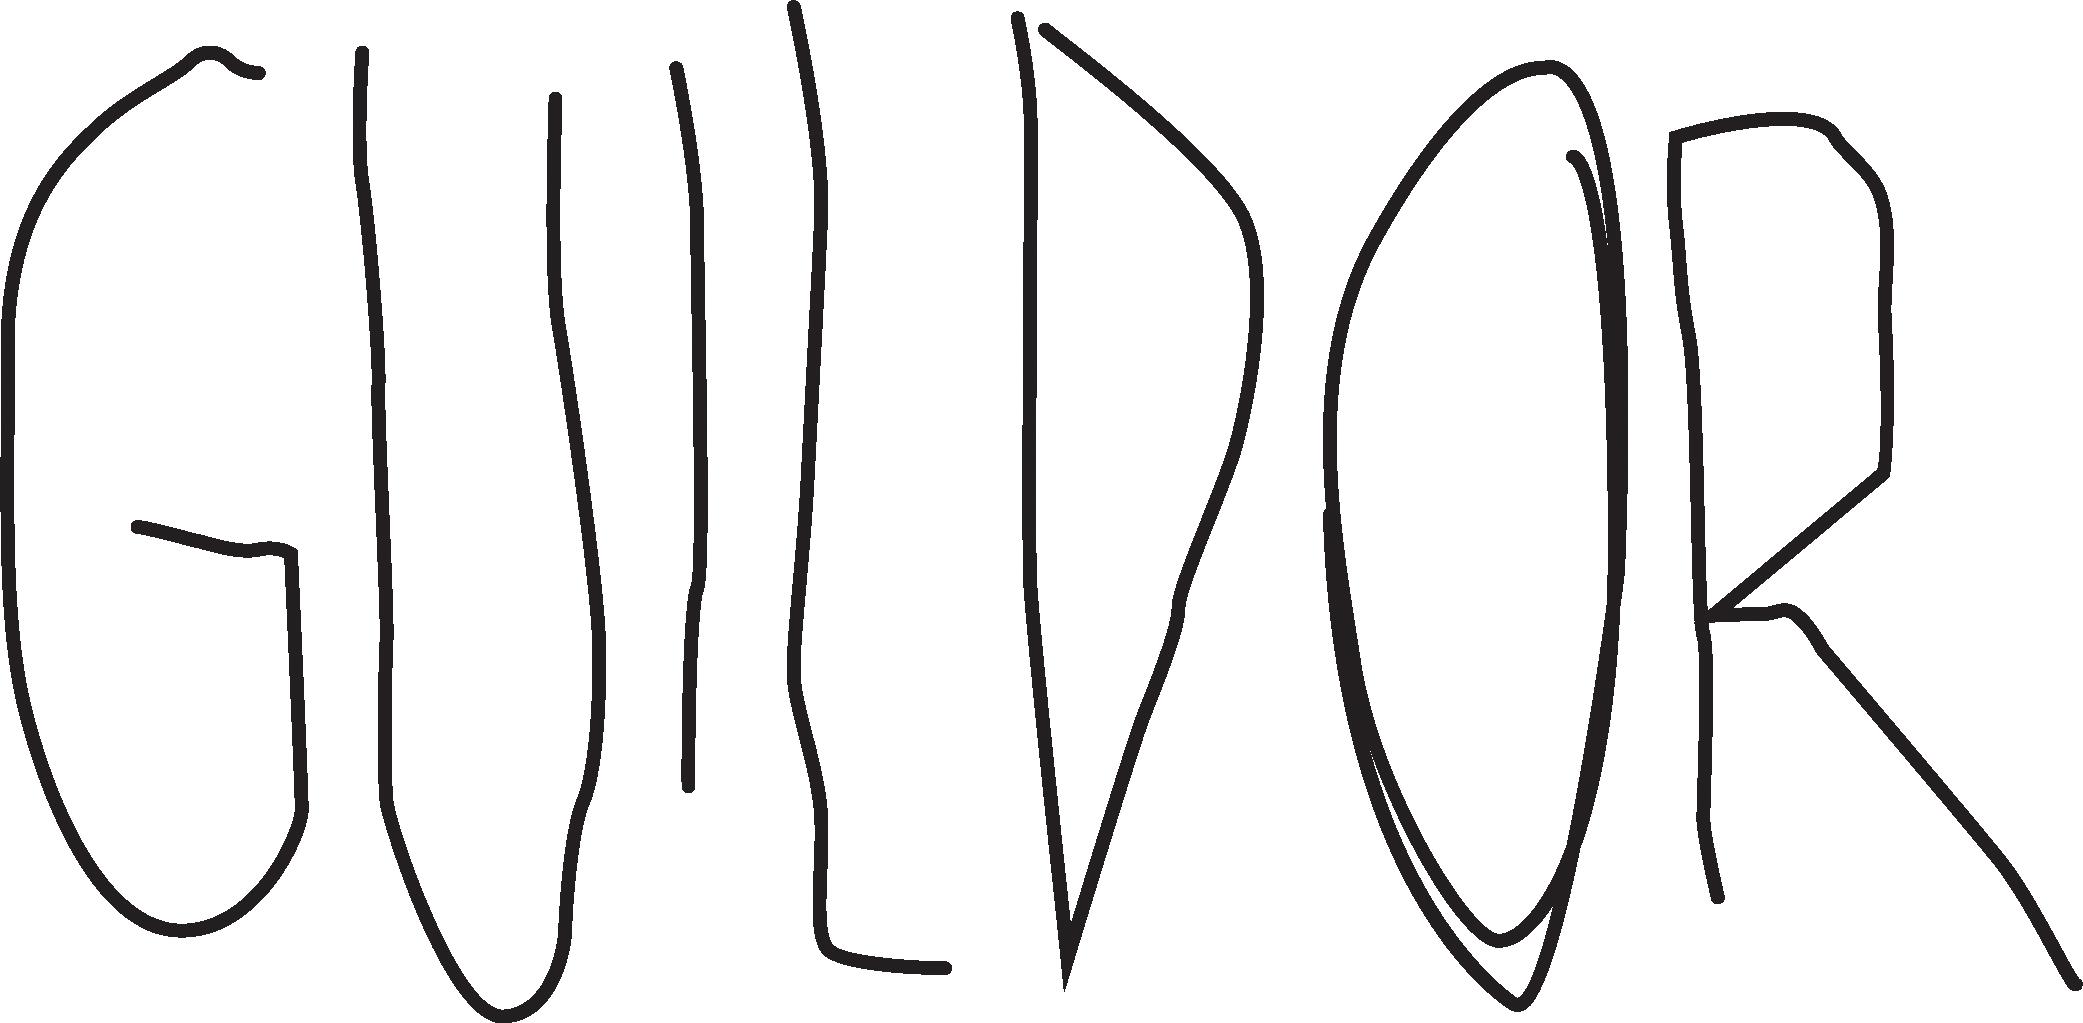 Guildor